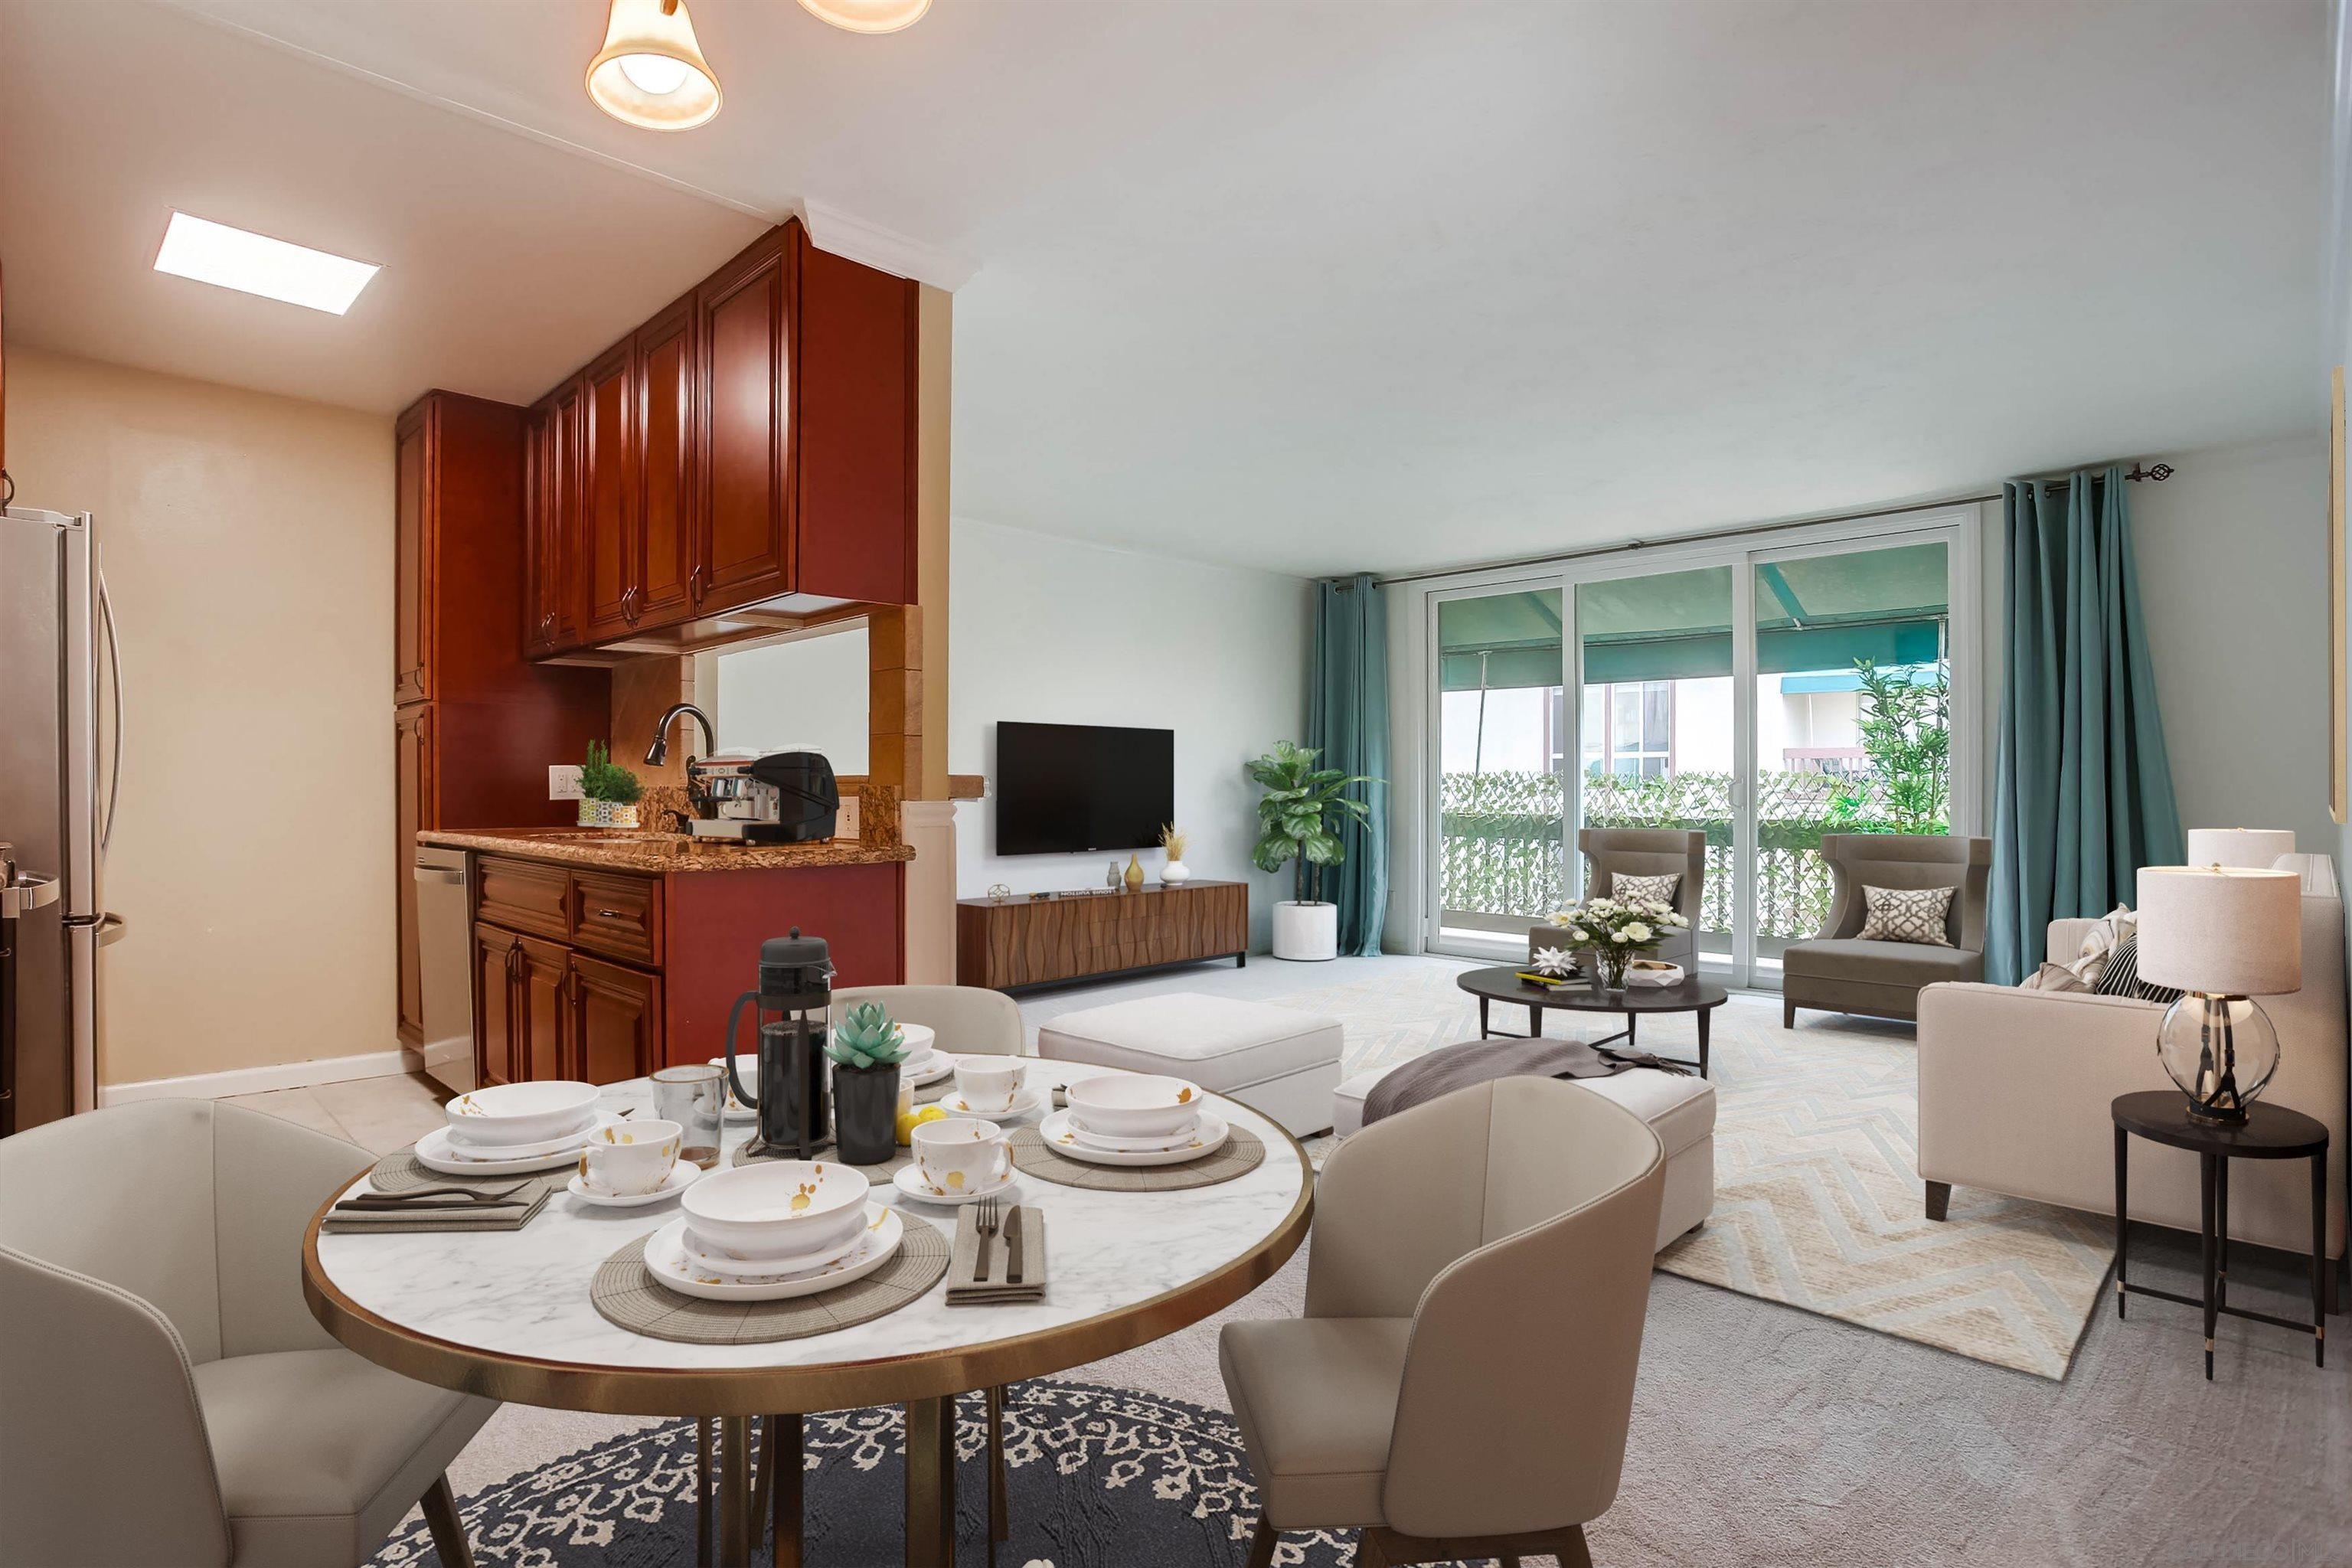 Main Photo: LA JOLLA Condo for sale : 1 bedrooms : 6455 La Jolla Blvd #354